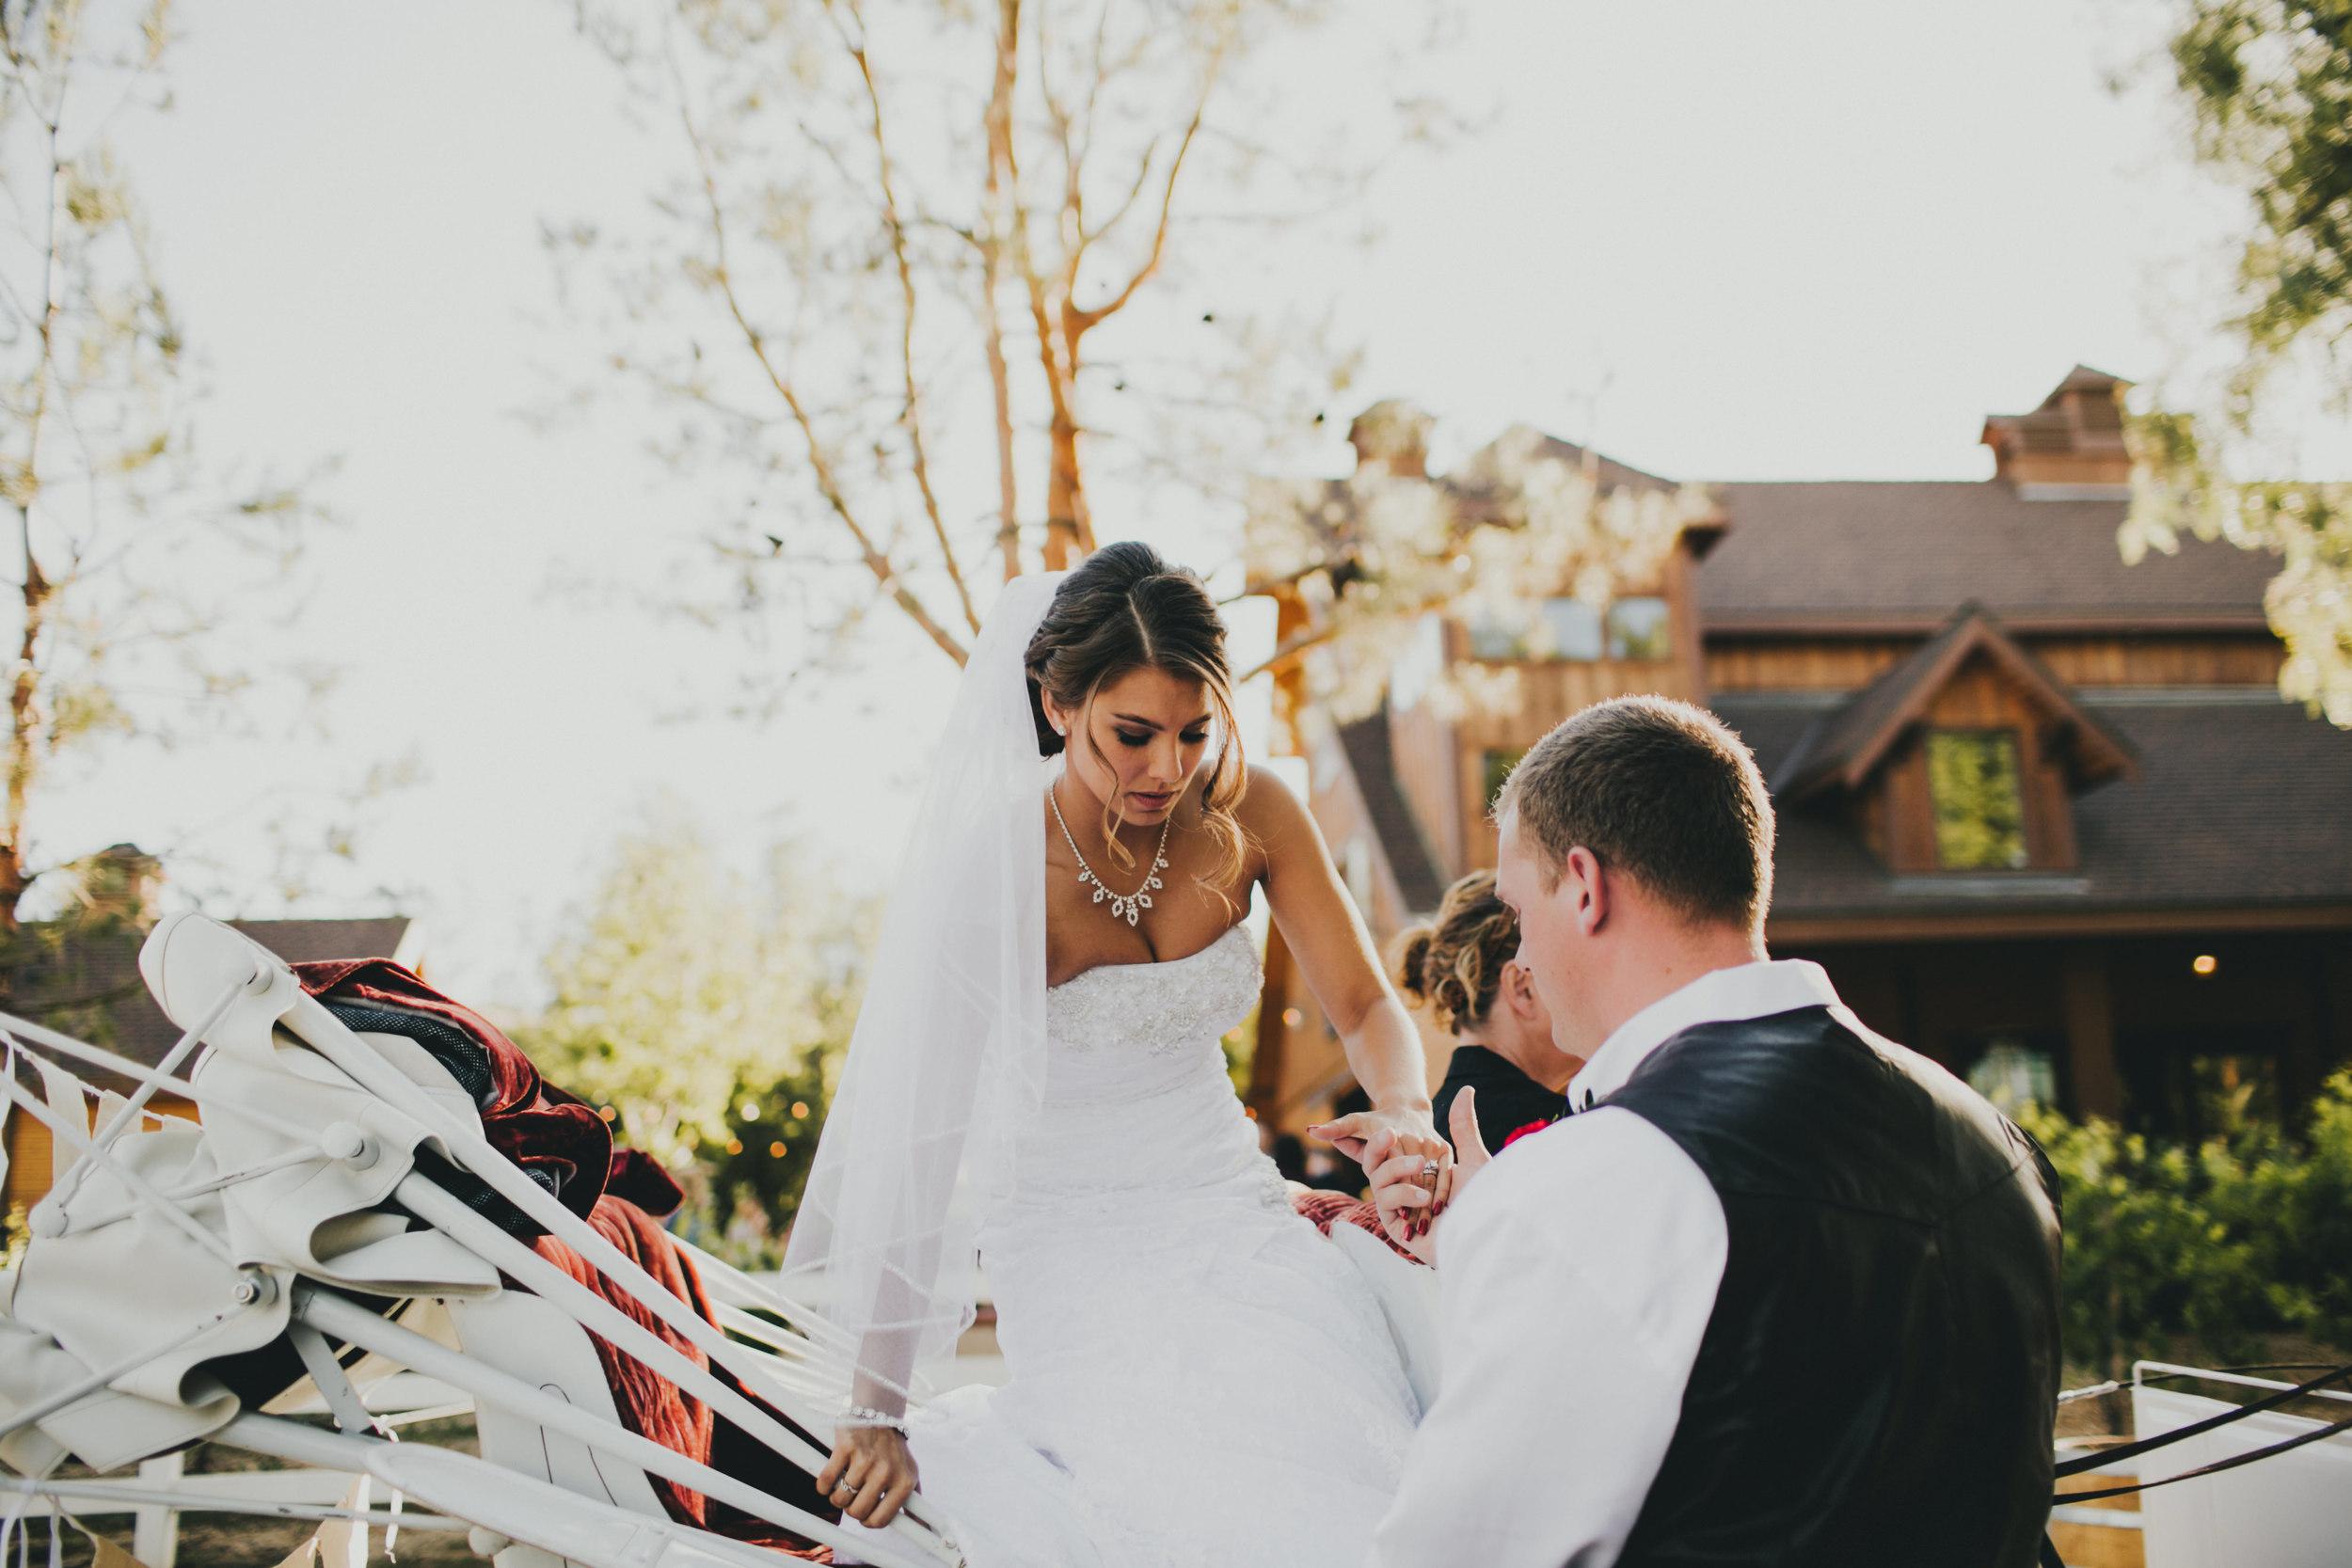 Cheyenne + Jordan - Wedding, Natalie Griffo (73 of 157).jpg